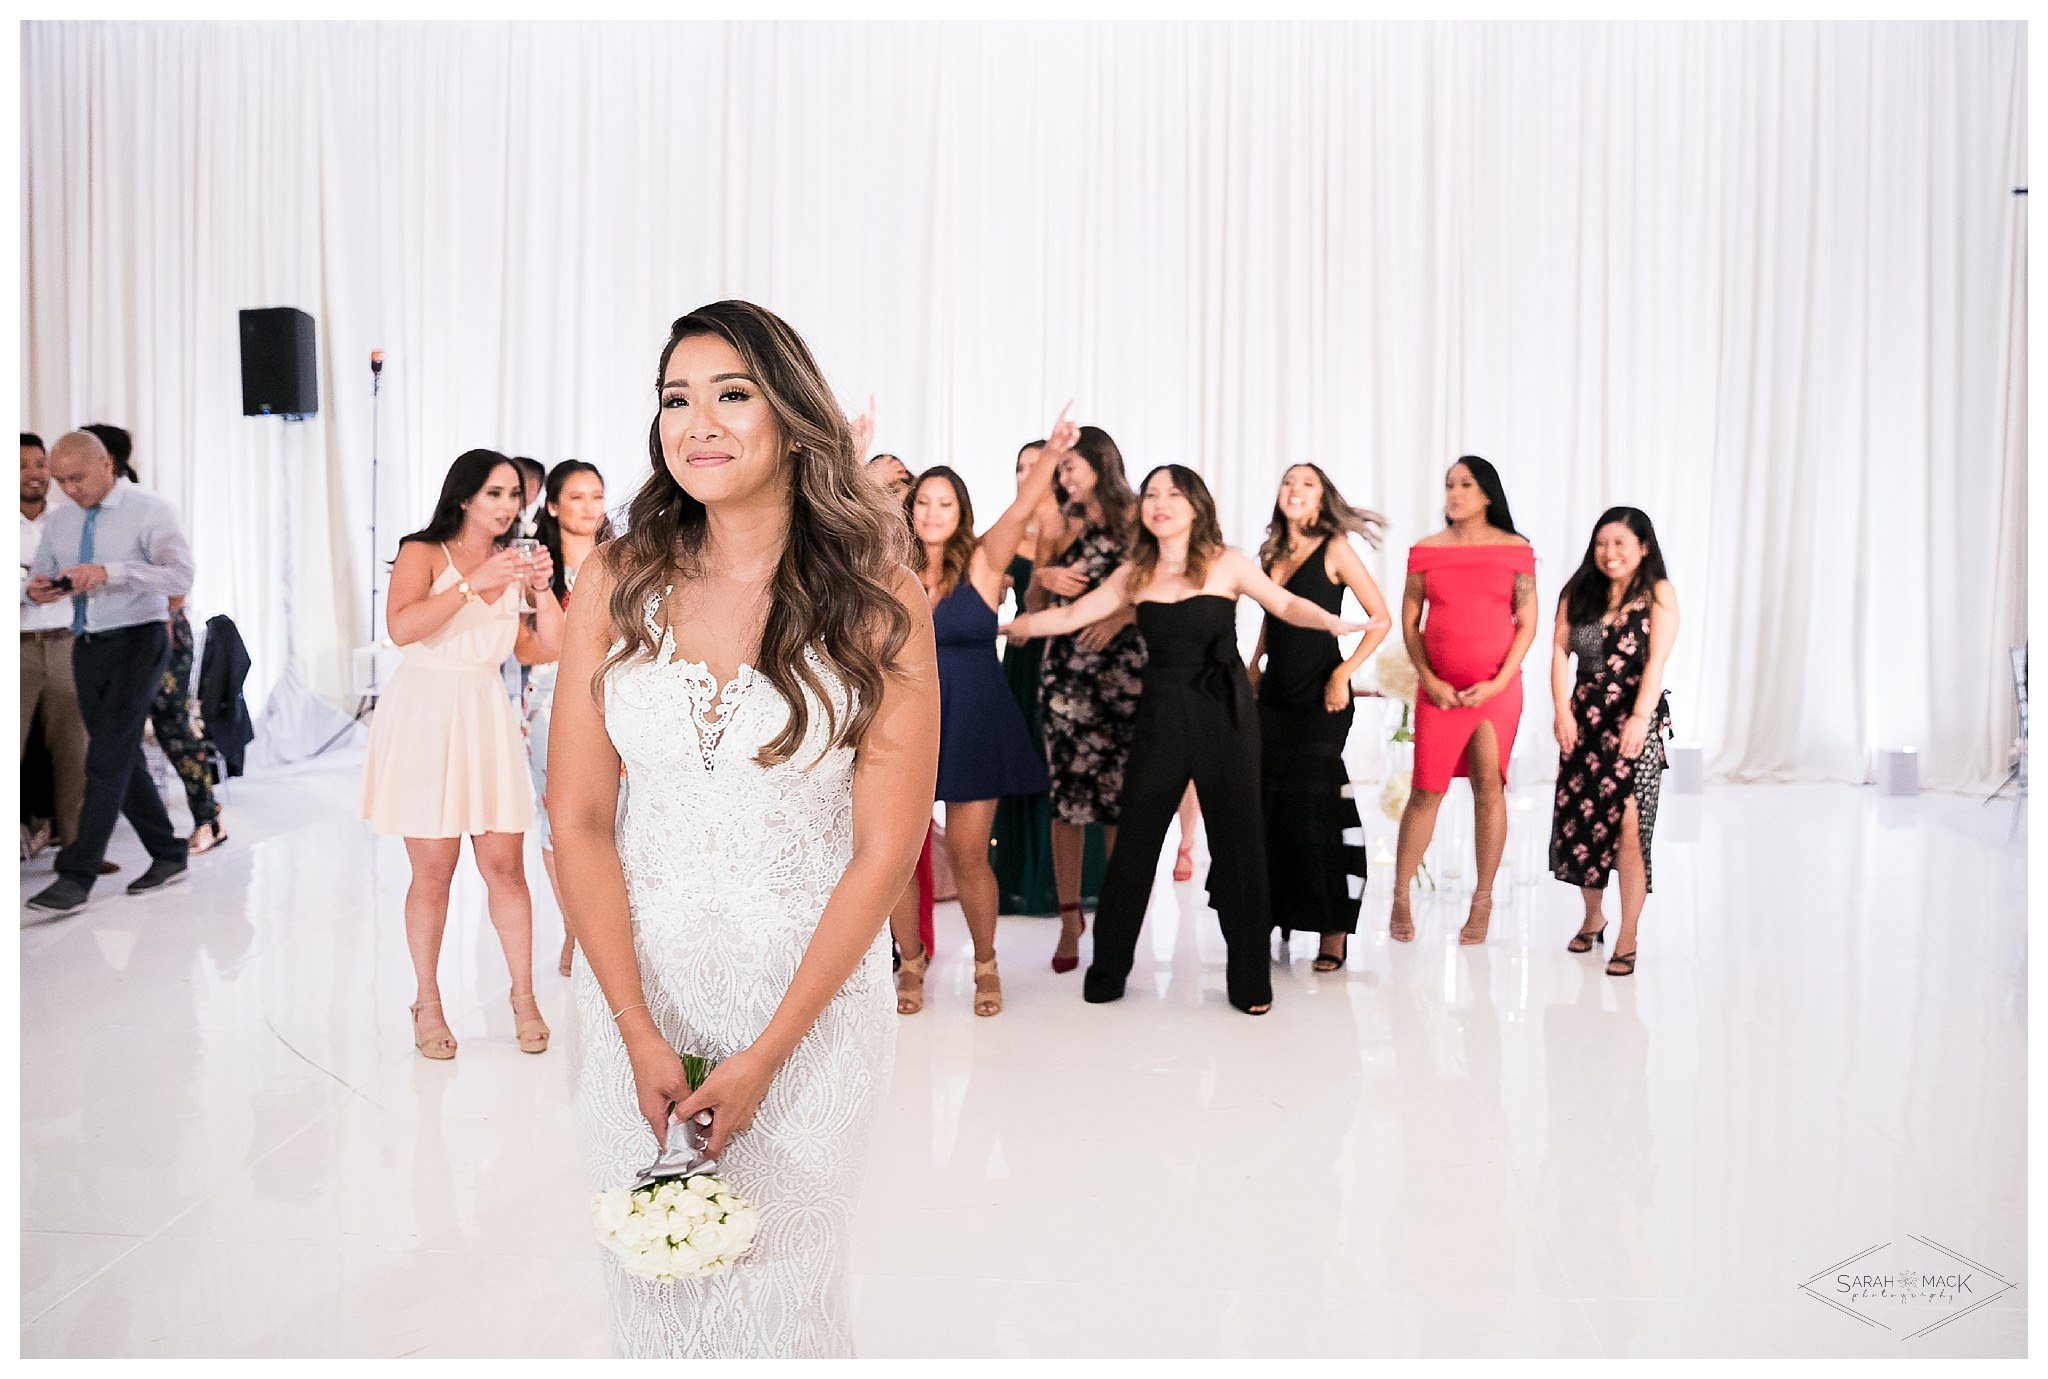 LE-Avenue-of-the-Arts-Costa-Mesa-Wedding-Photography-0210.jpg